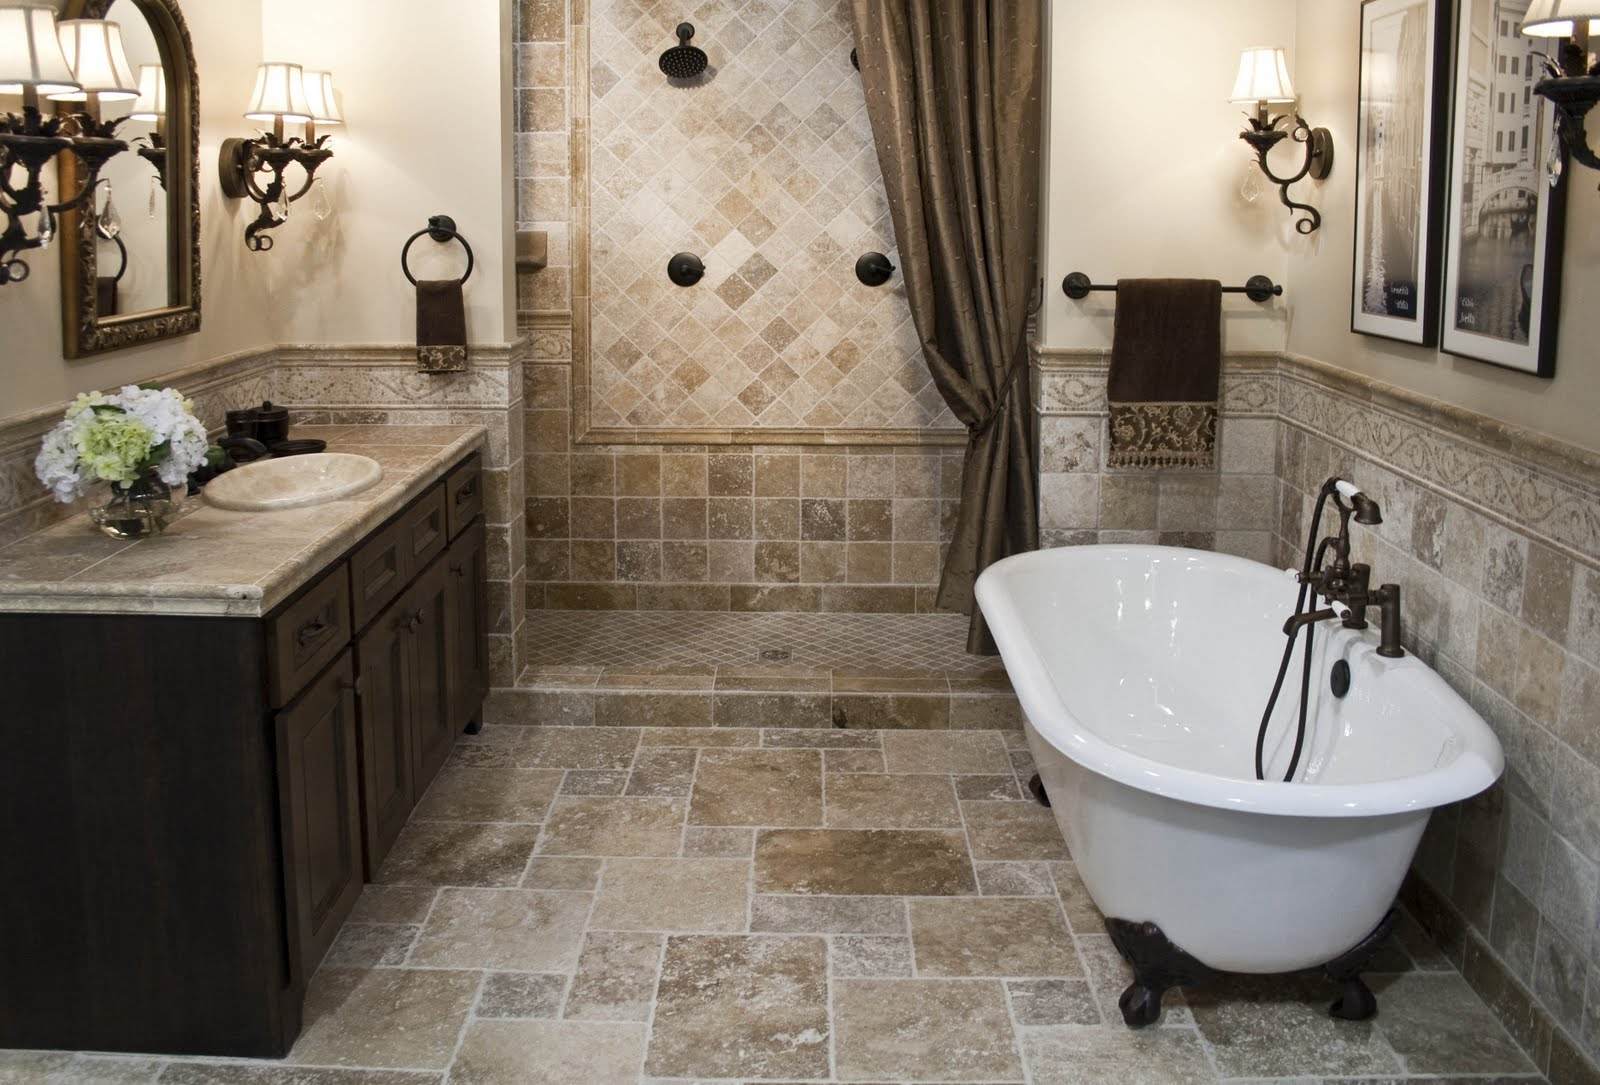 remodel bathroom ideas - 28 images - 25 bathroom remodeling ideas